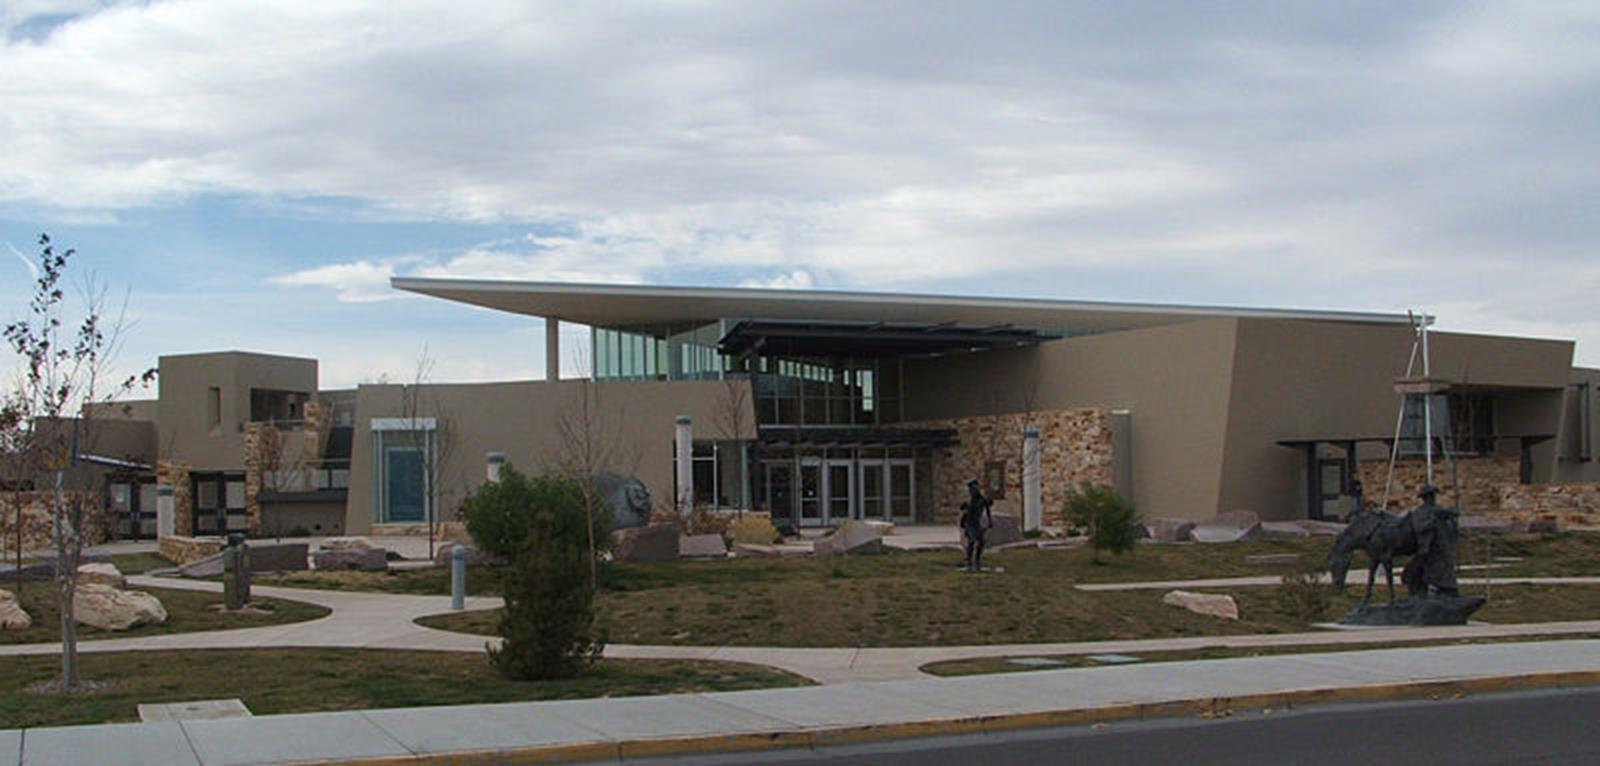 Albuquerque Museum. Credits: Wikipedia